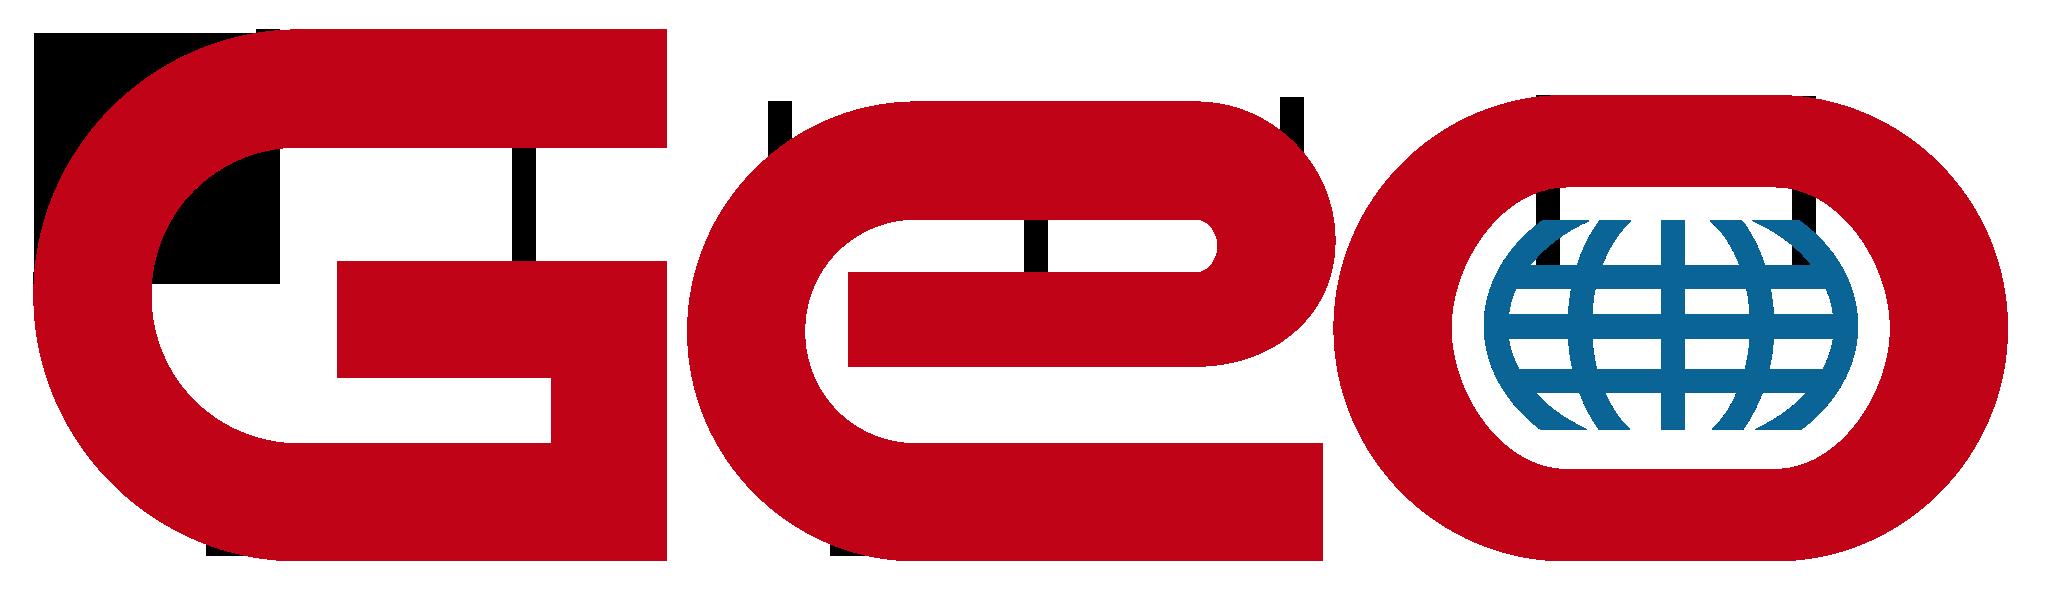 Geo Logo, HD Png, Information.